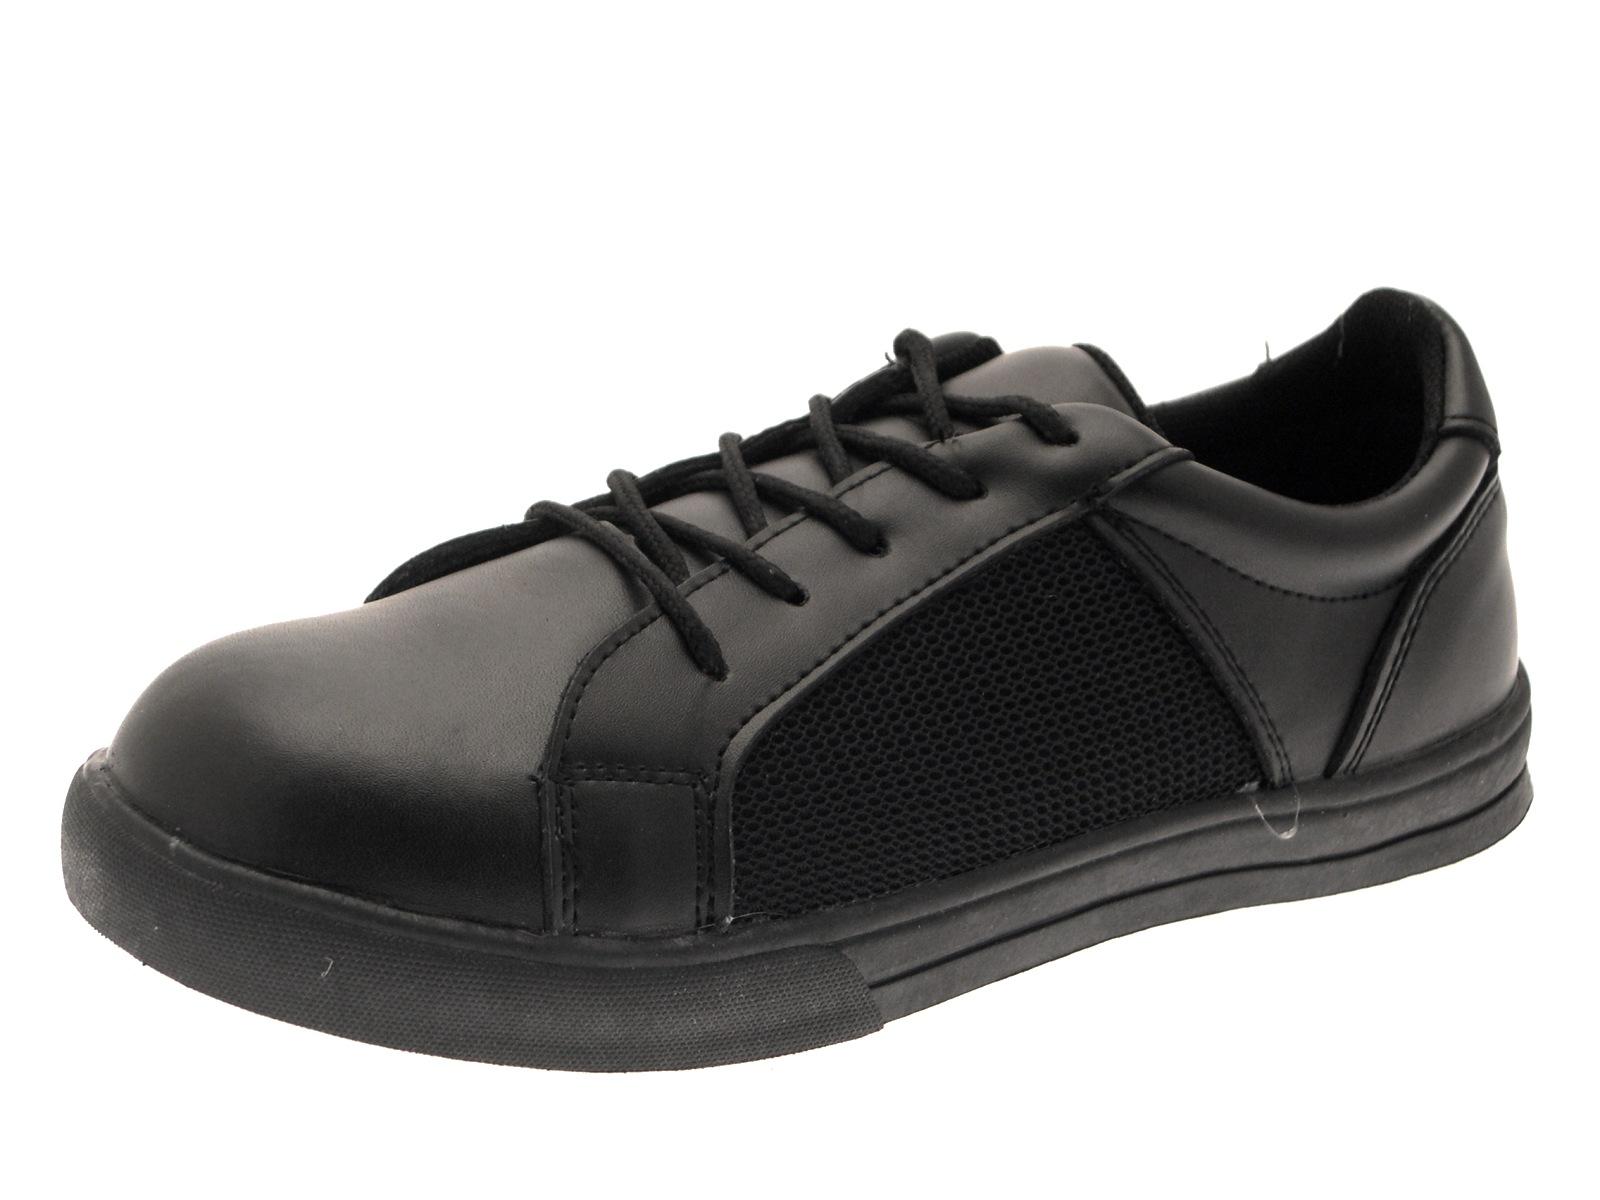 Boys Black Leather School Shoes Flat